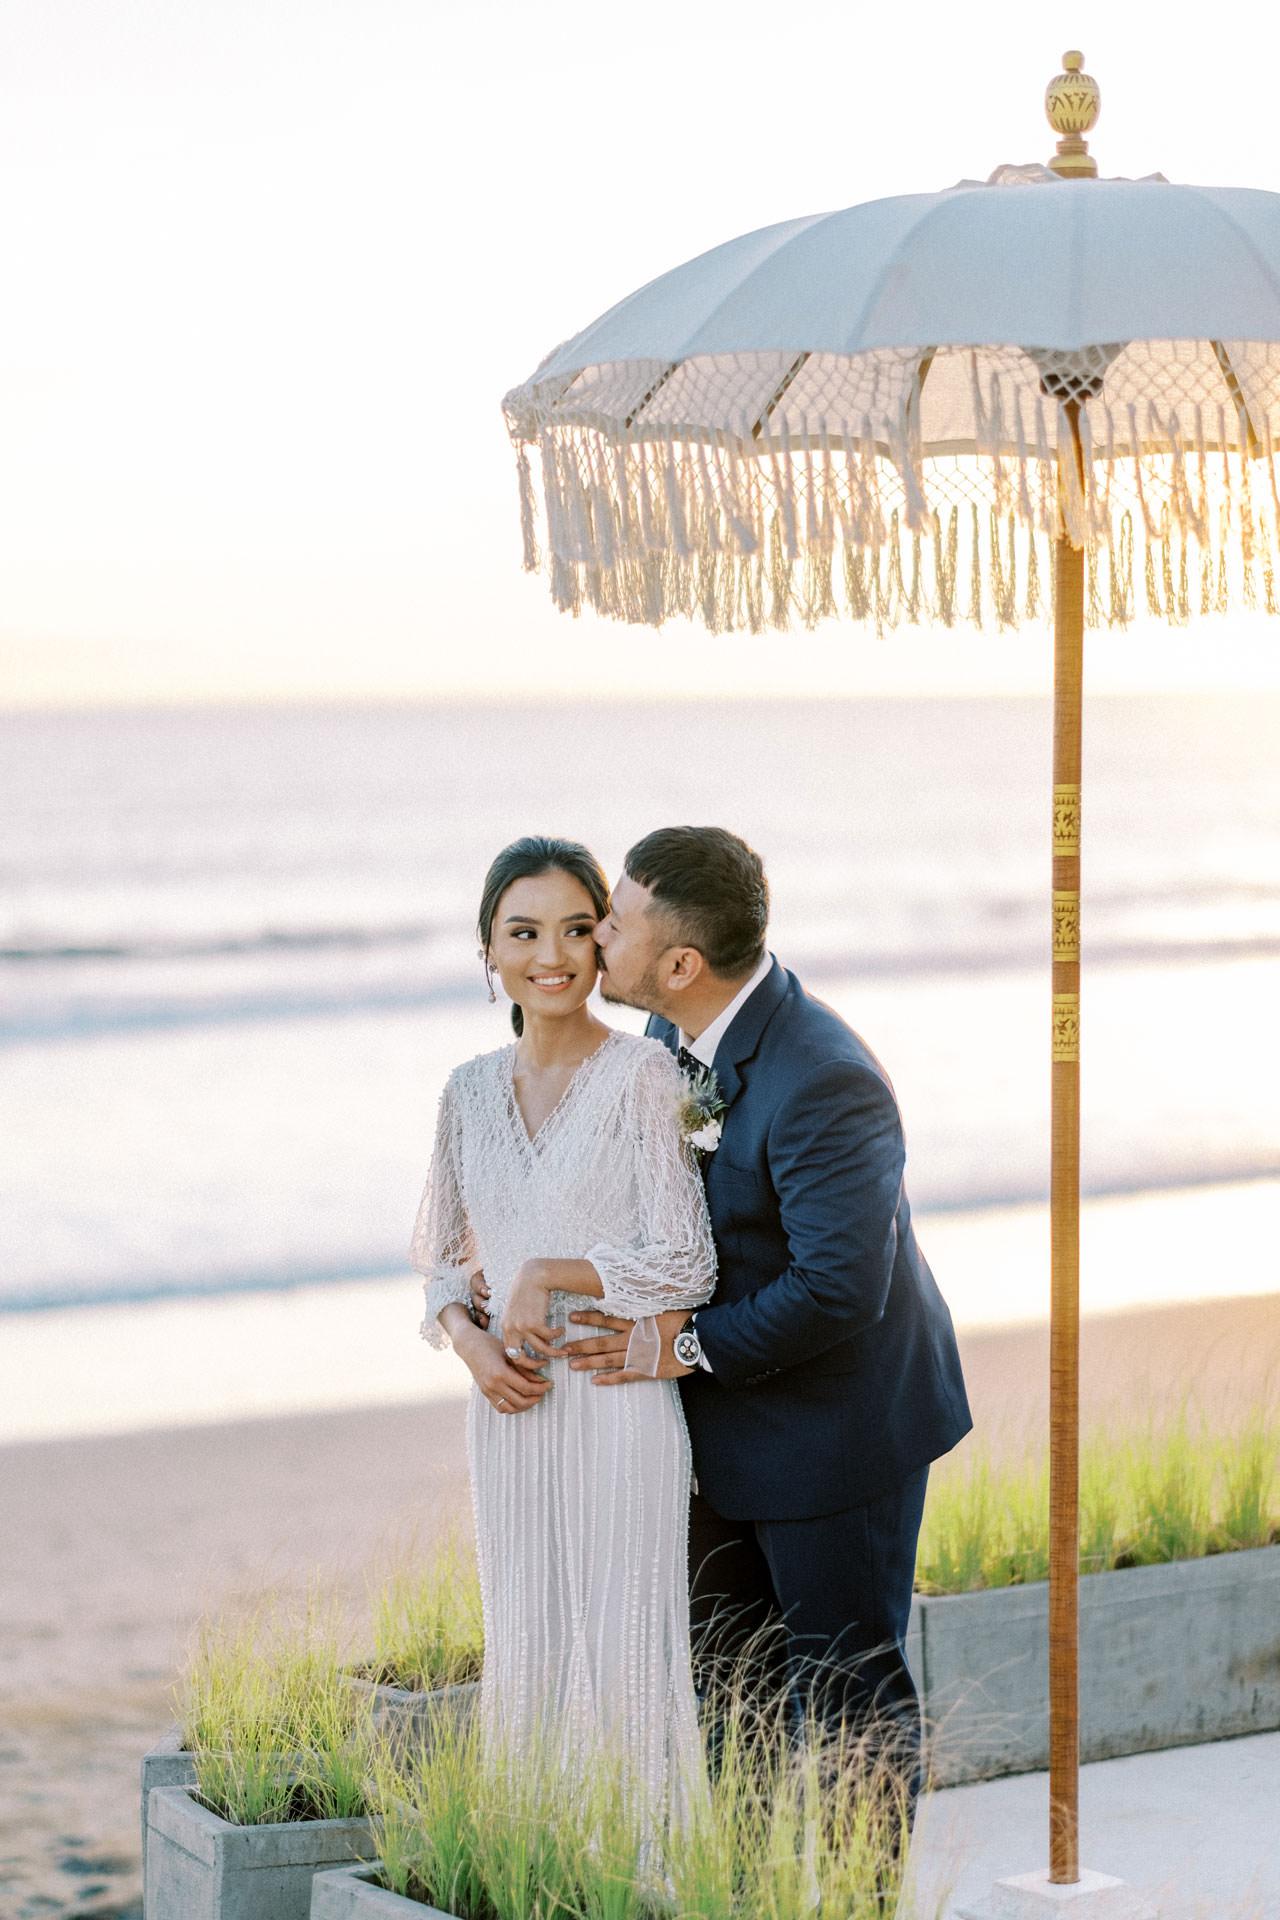 Bali Beach Glamping Wedding on a Luxury Tent 53